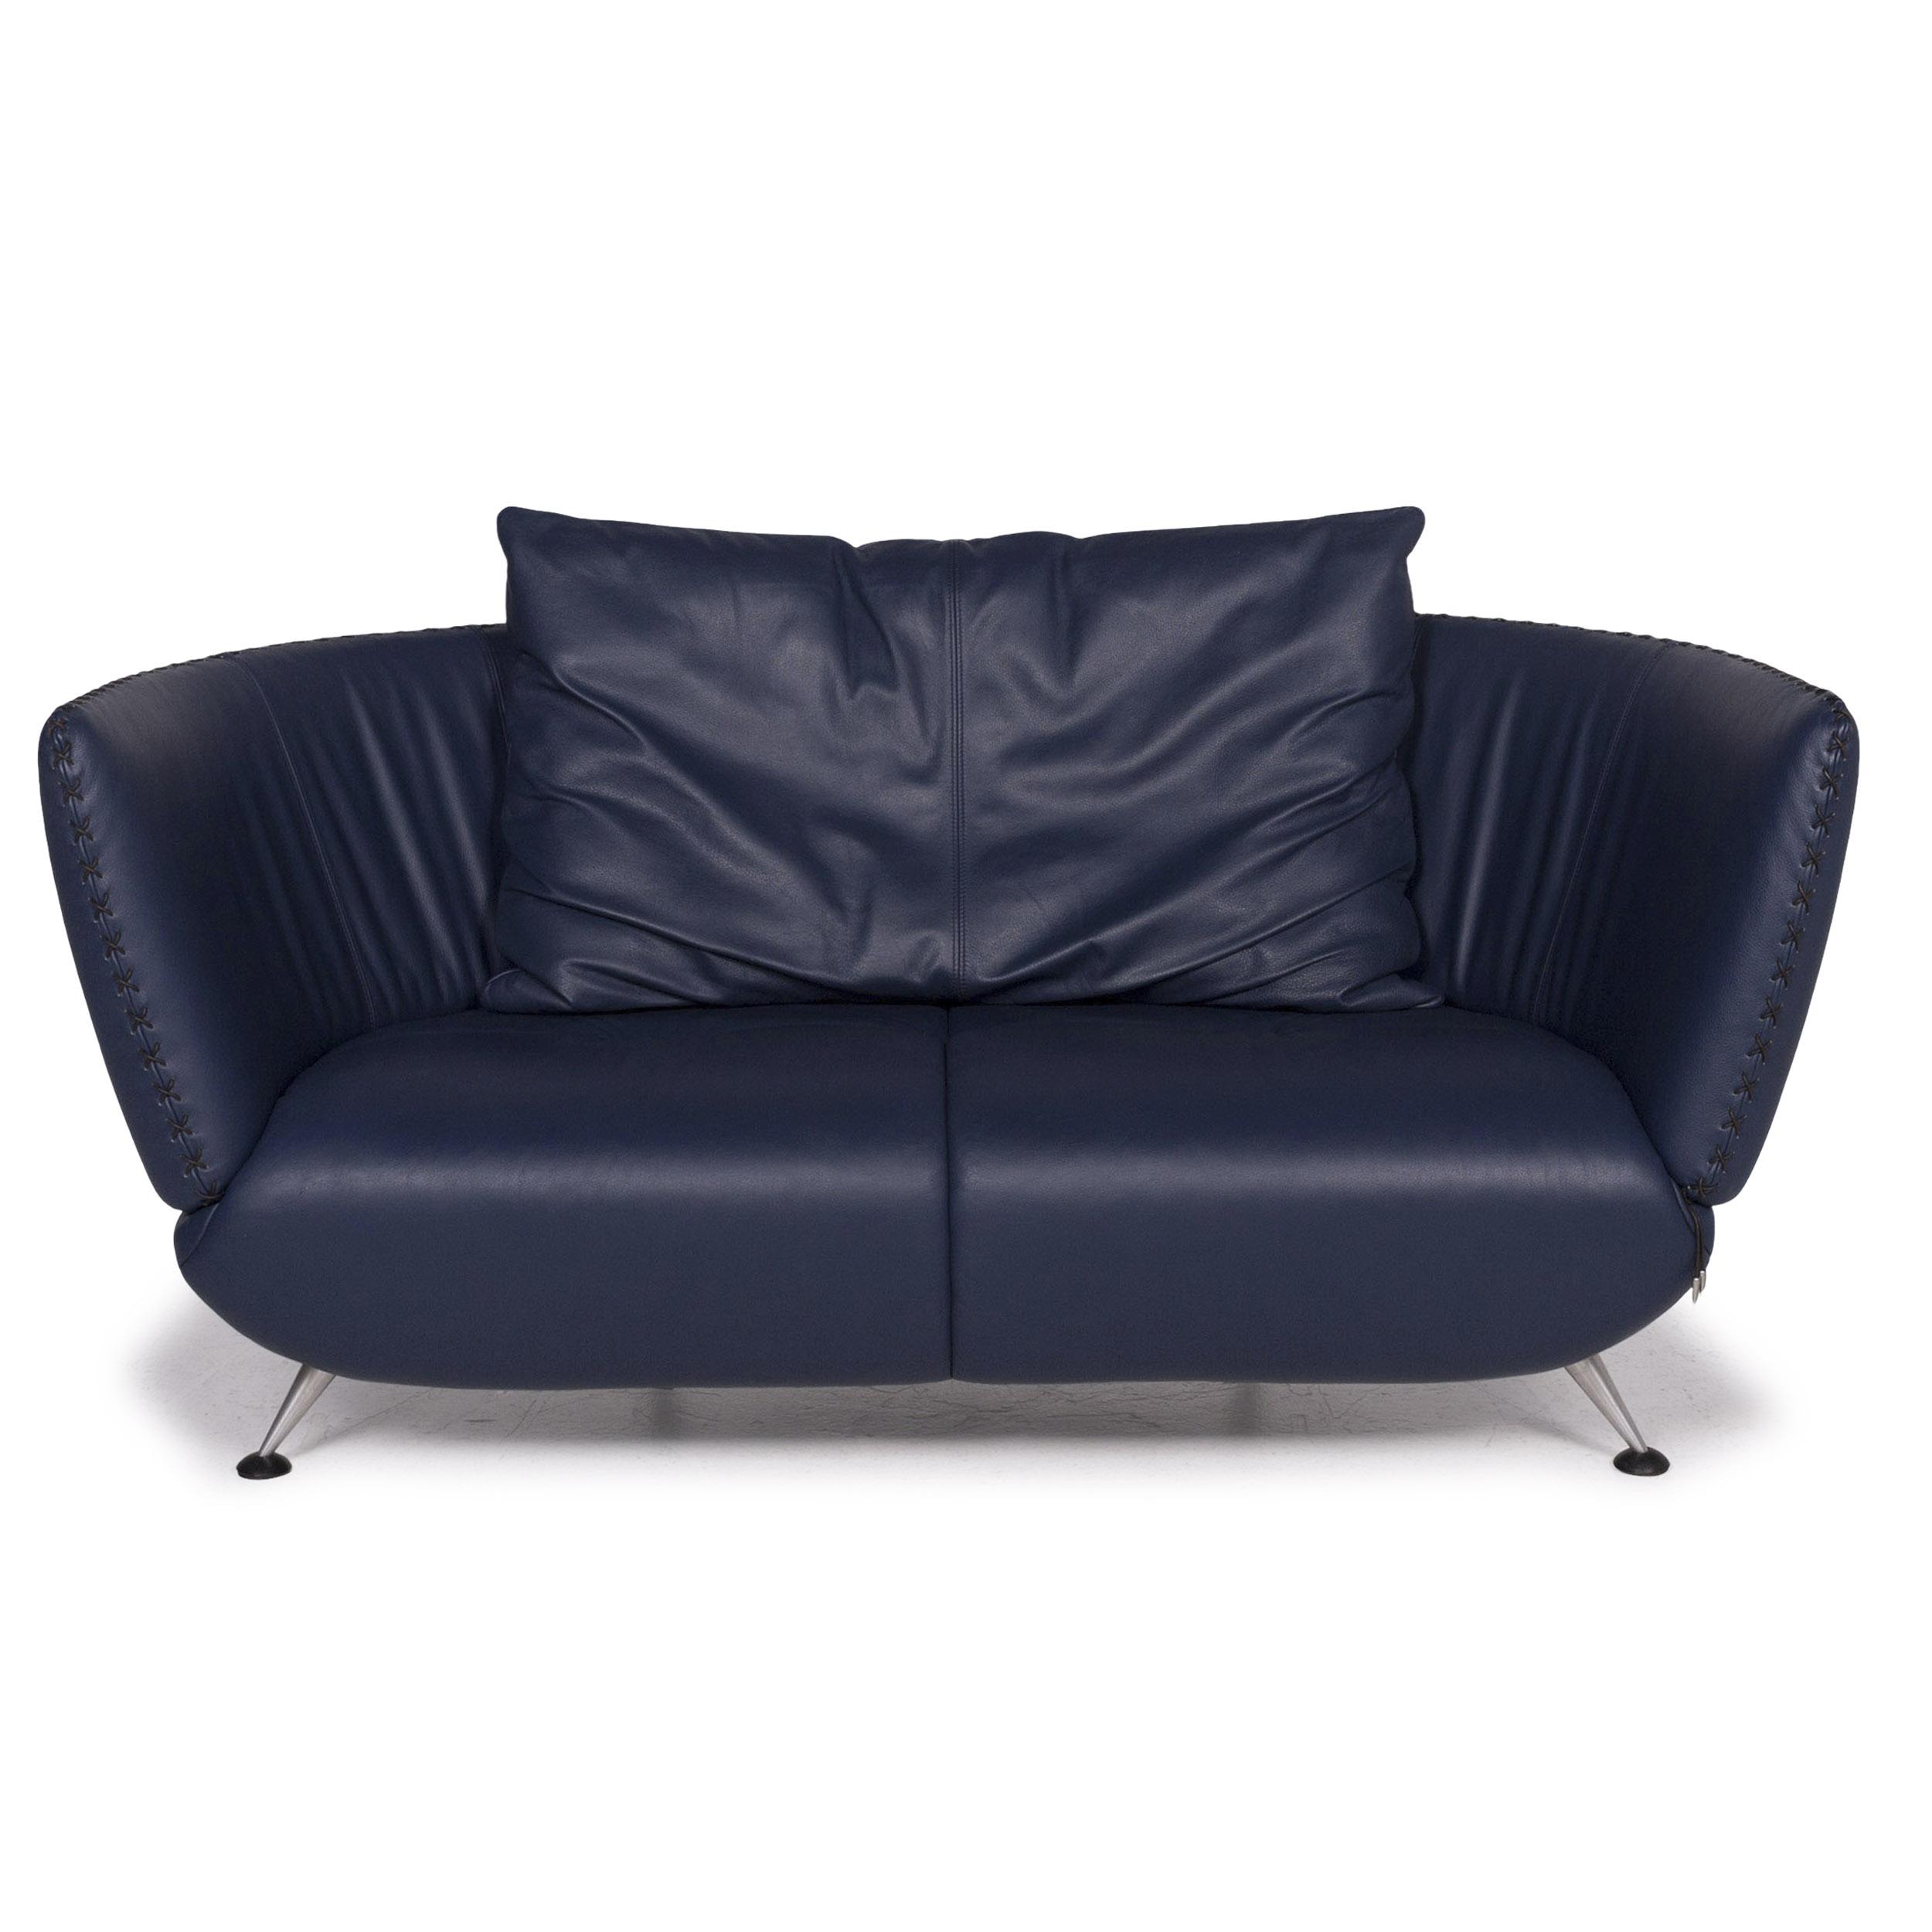 Full Size of De Sede Des 102 Leder Sofa Blau Zweisitzer 11536 Revive Interior Angebote Machalke Big Kaufen Mit Led Reinigen Stoff Bettfunktion U Form Xxl Günstig Sofa Sofa Blau